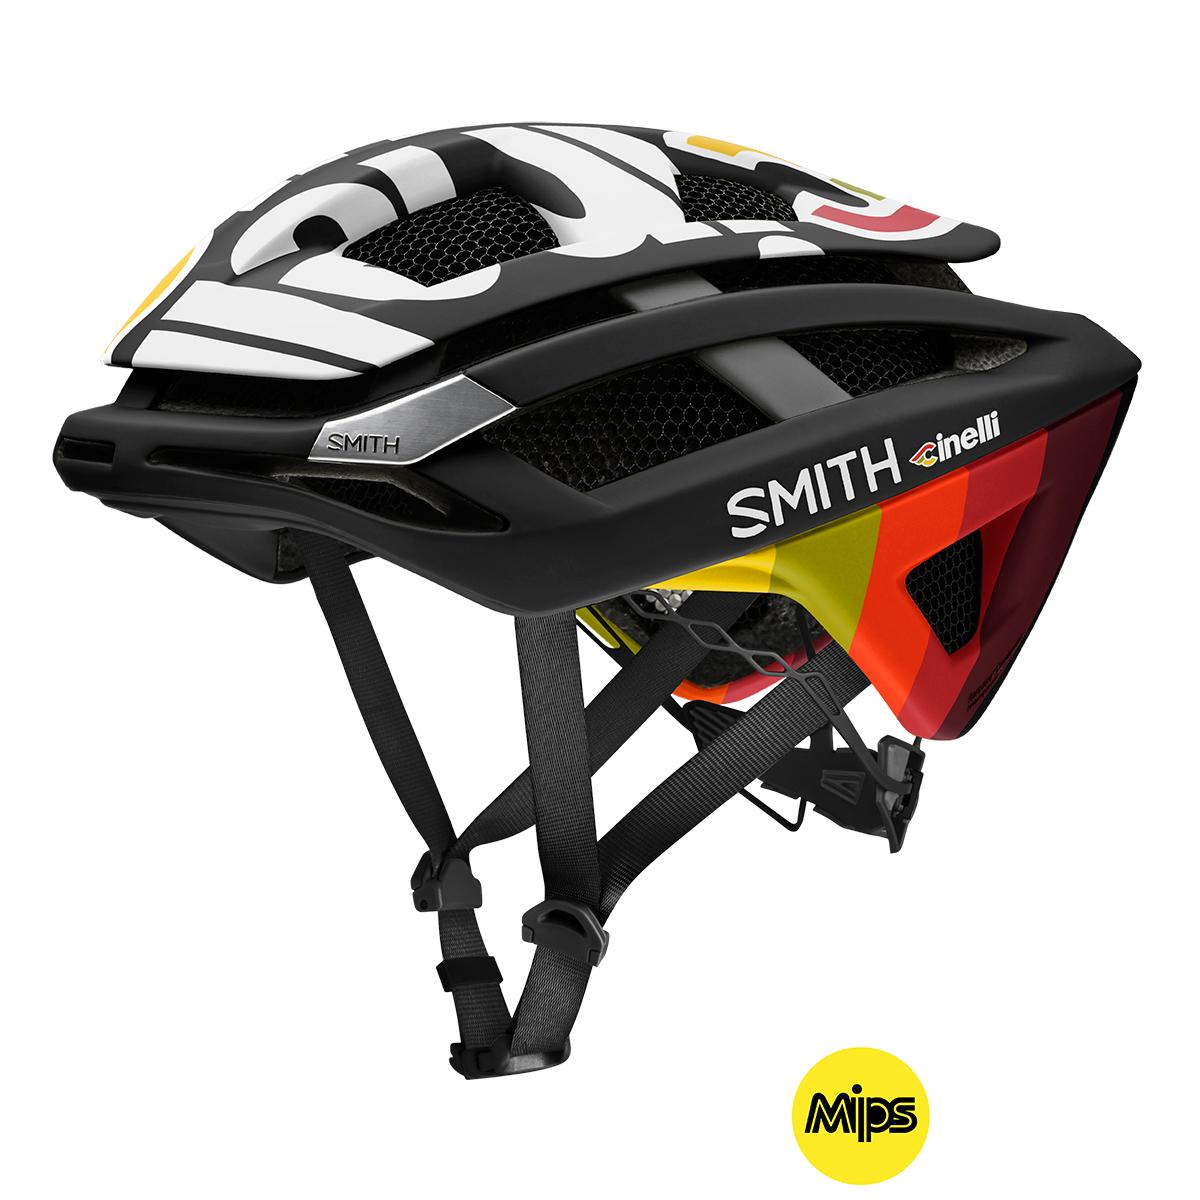 SMITH Overtake MIPS(スミス オーバーテイク ミップス) ヘルメット 2018